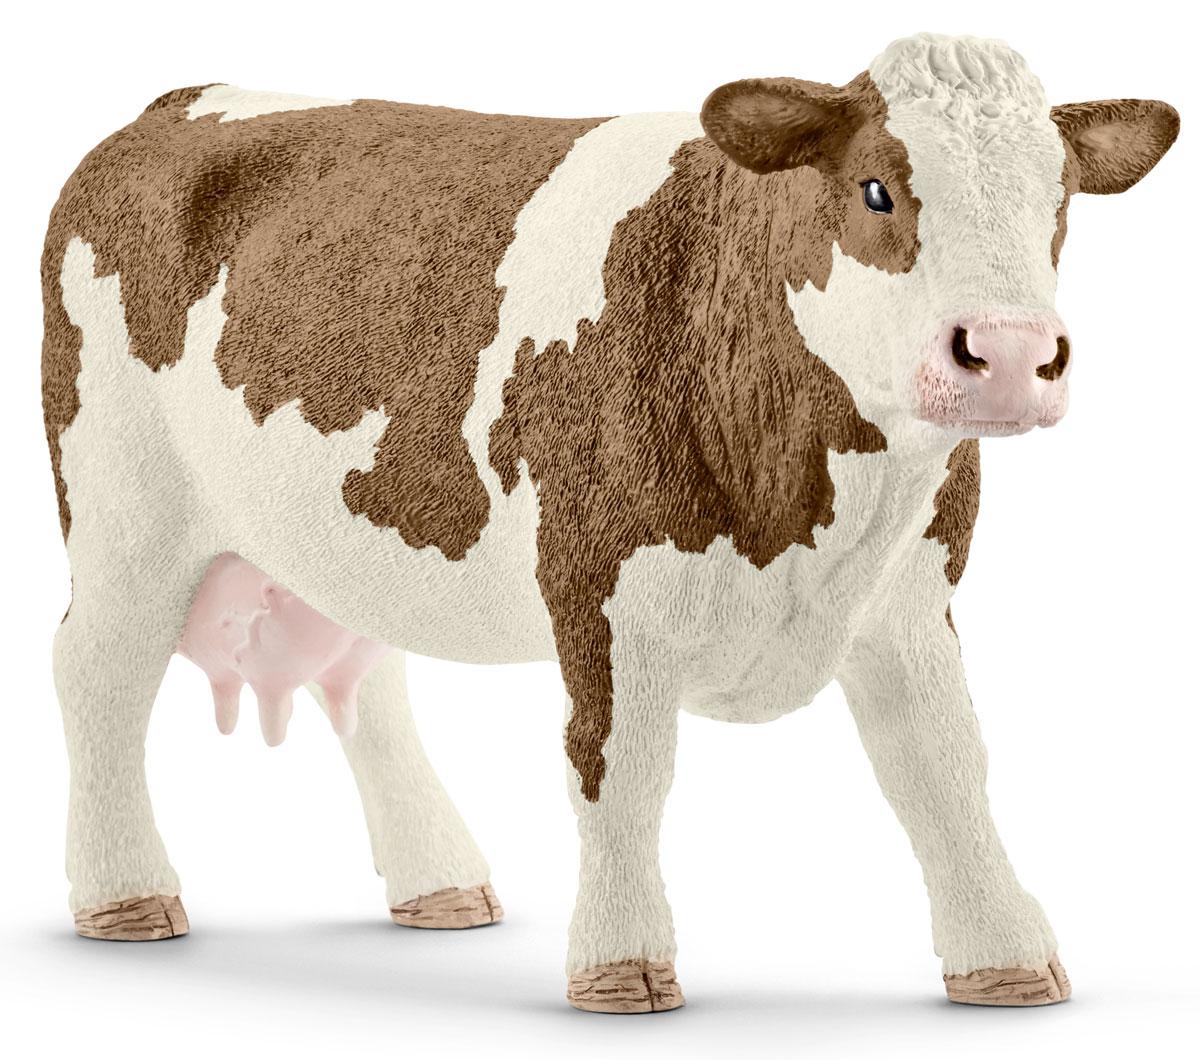 Schleich Фигурка Симментальская корова 13801 schleich гольштинская корова